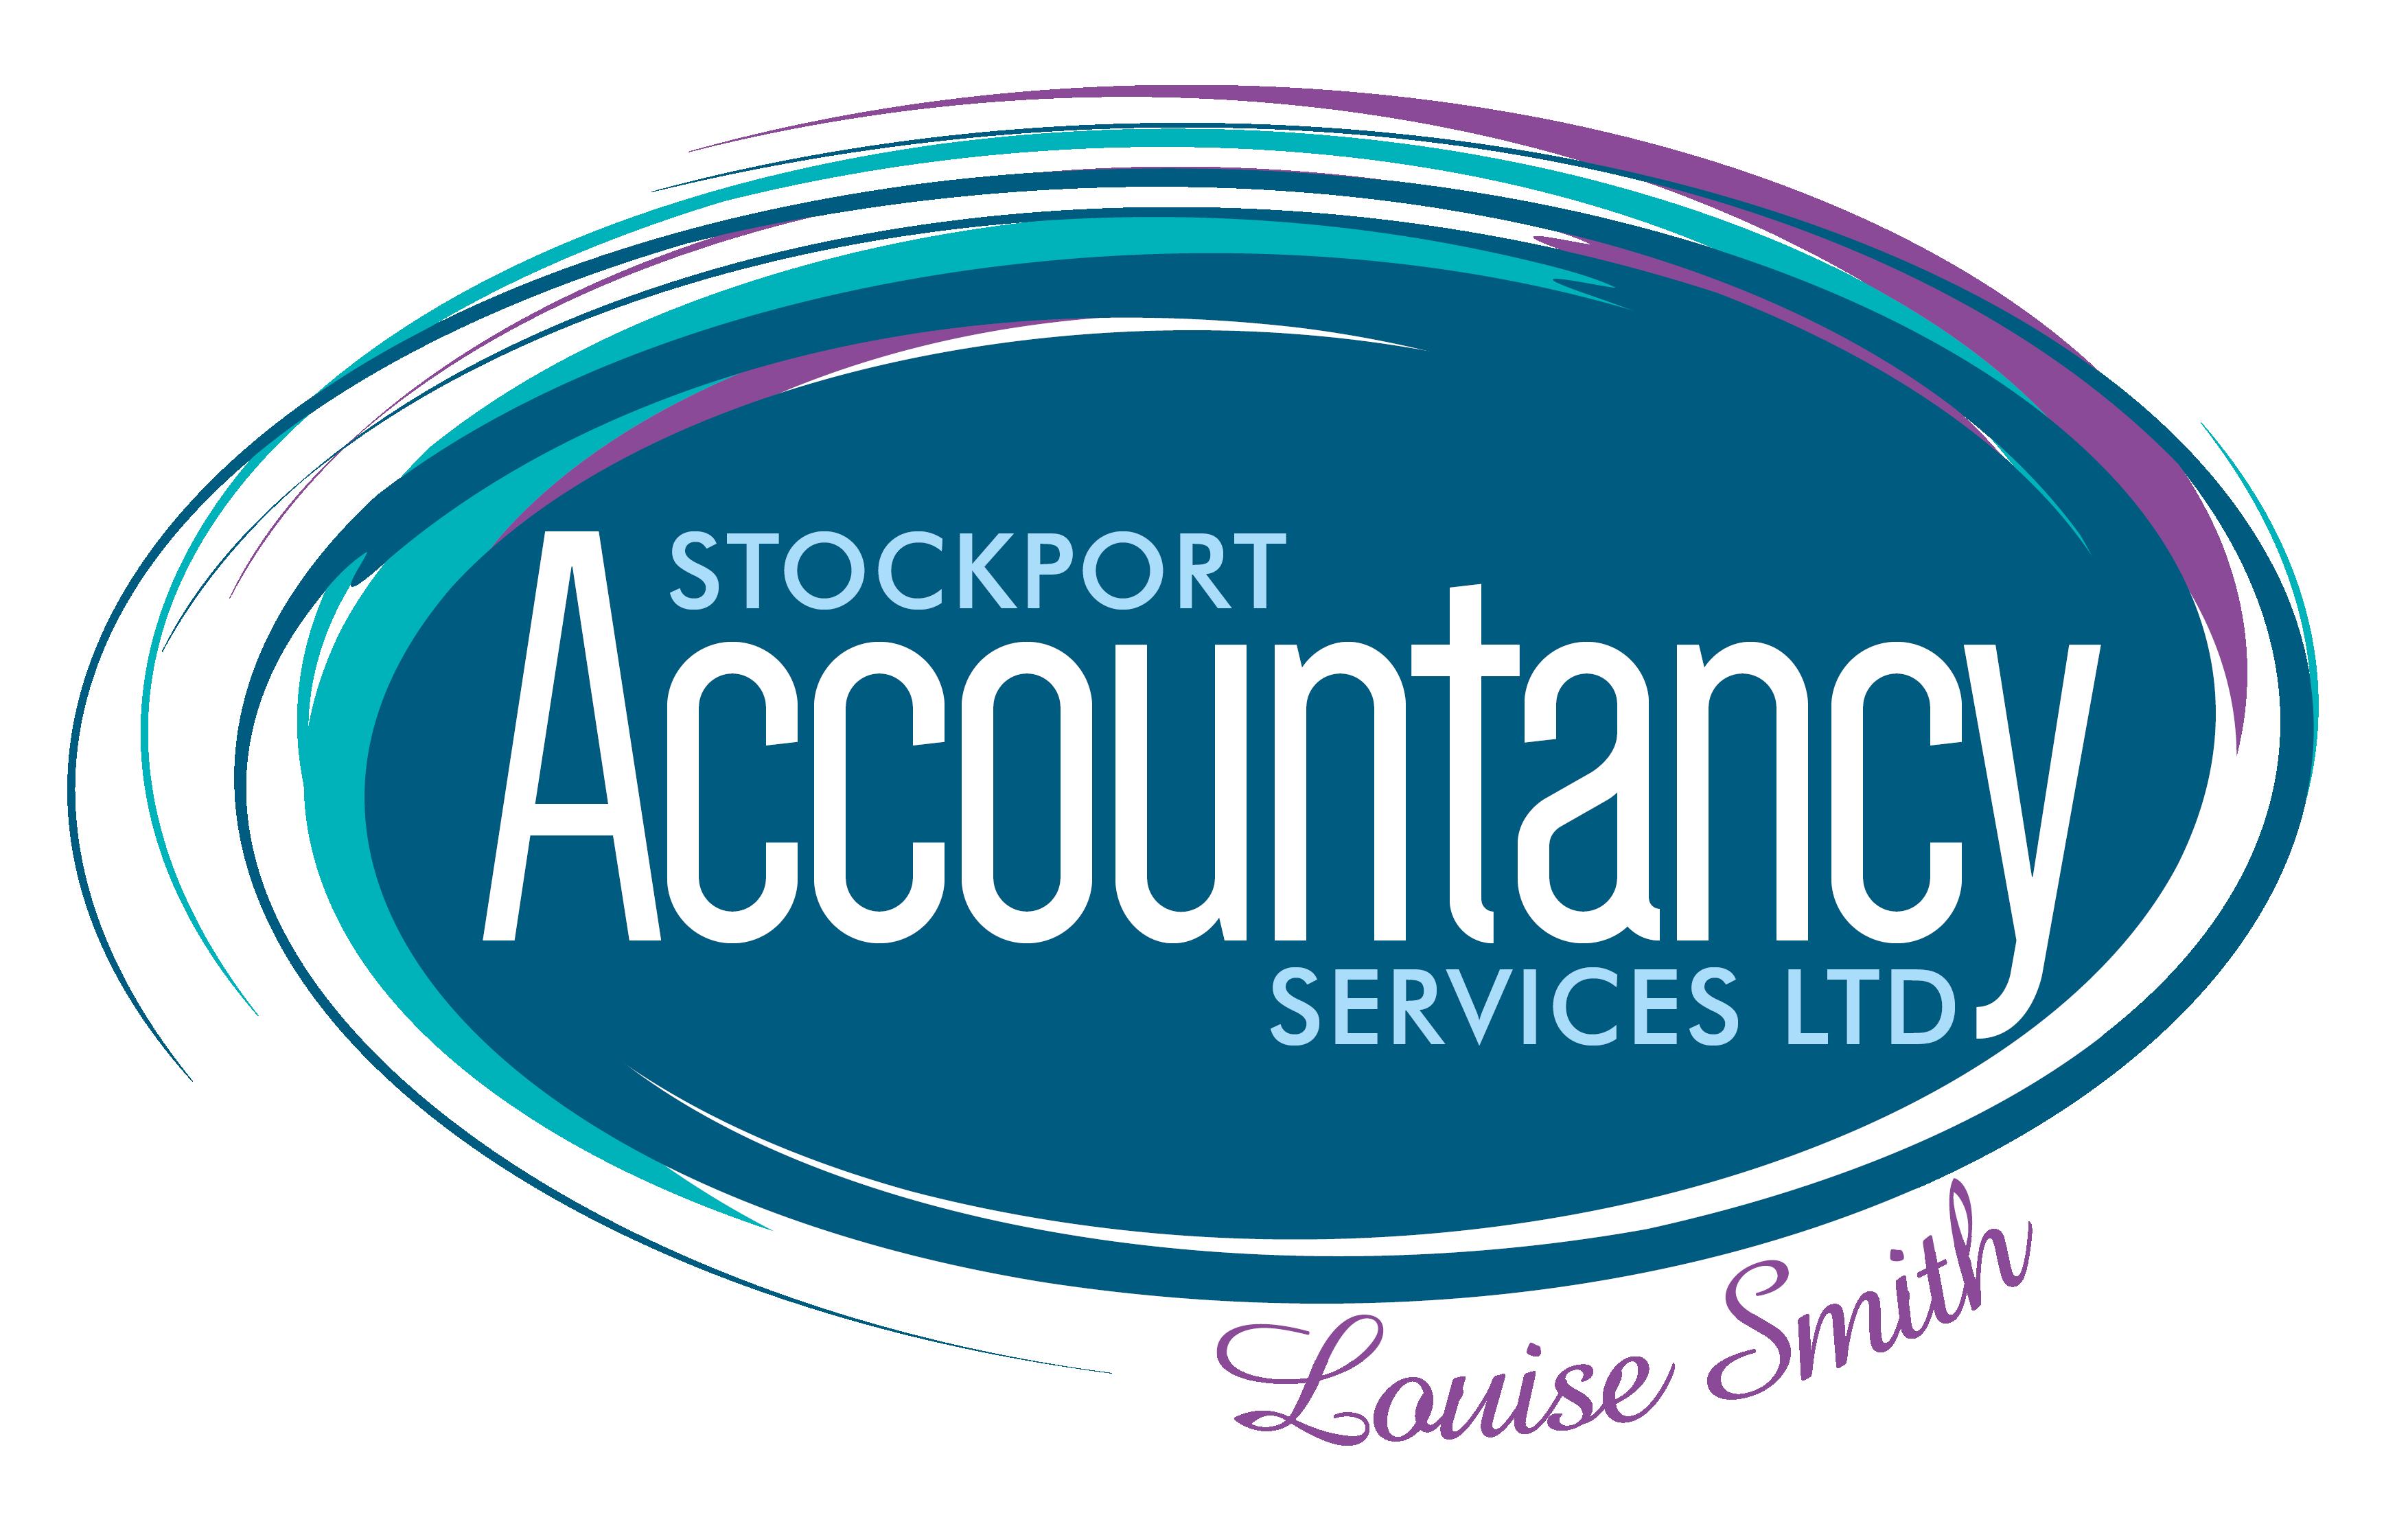 Stockport Accountancy